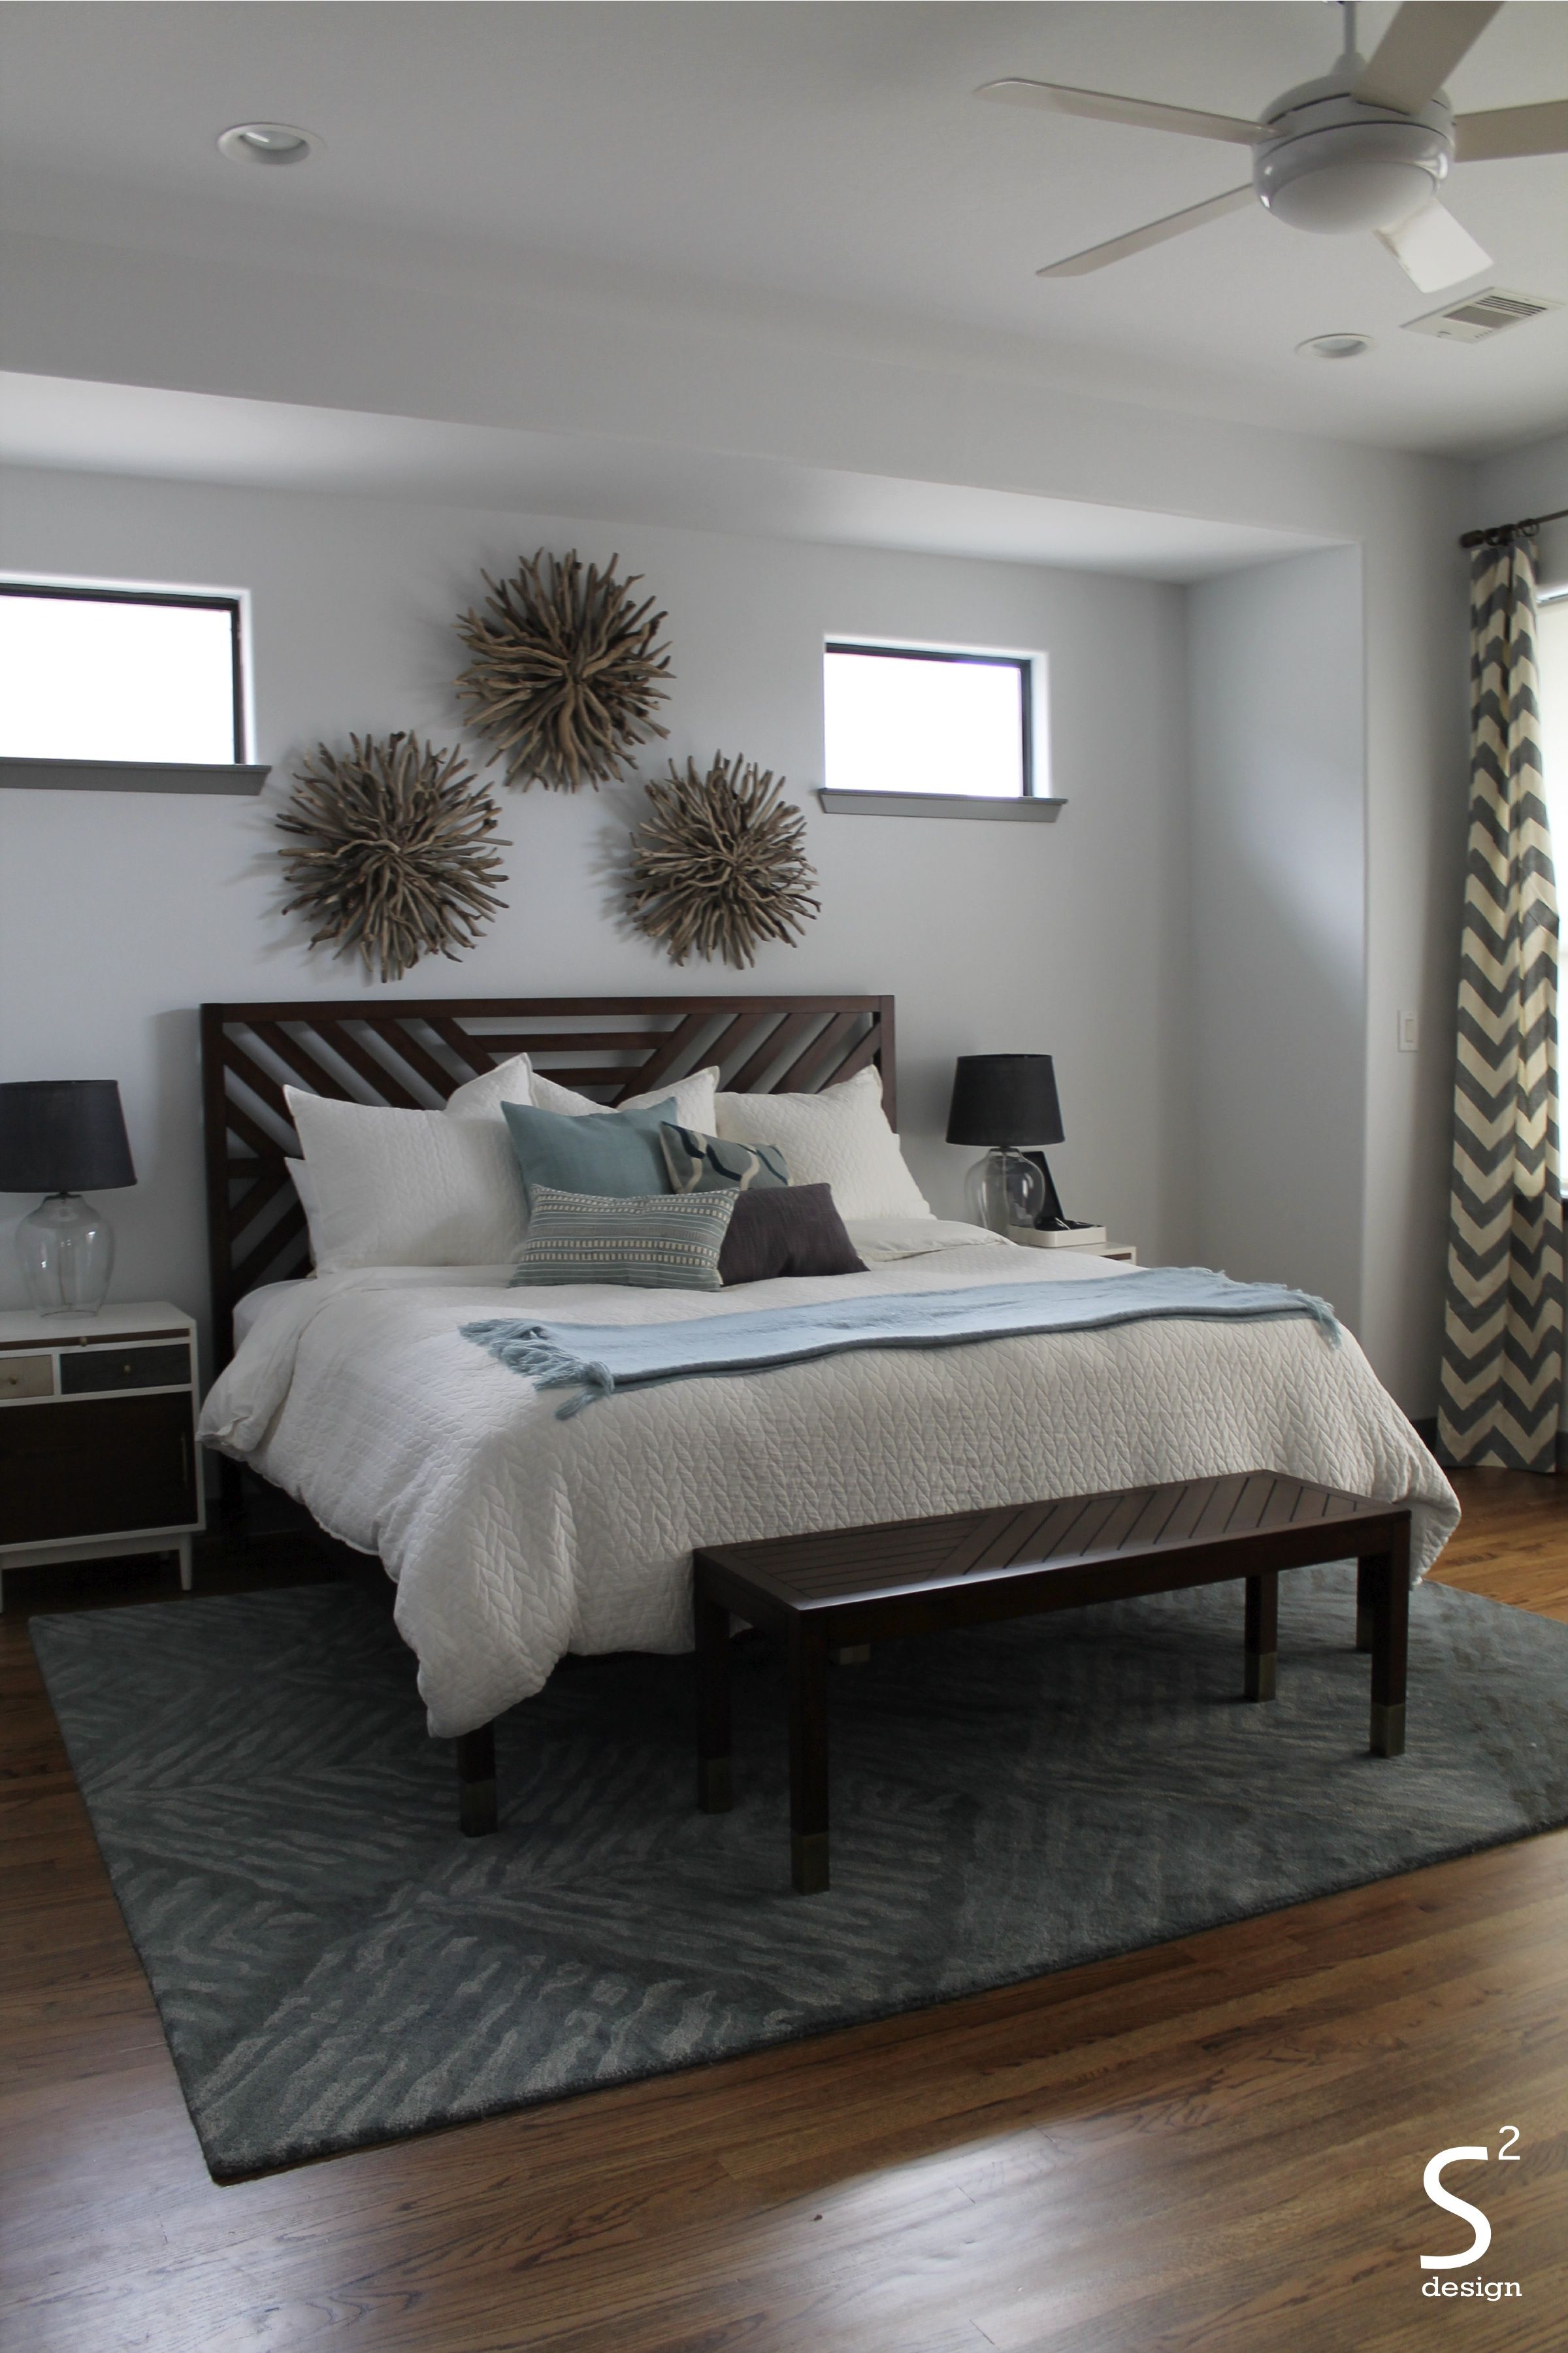 houston heights midcentury modern living room blue rug blue  - houston heights midcentury modern living room blue rug blue accentswhite organic bedding